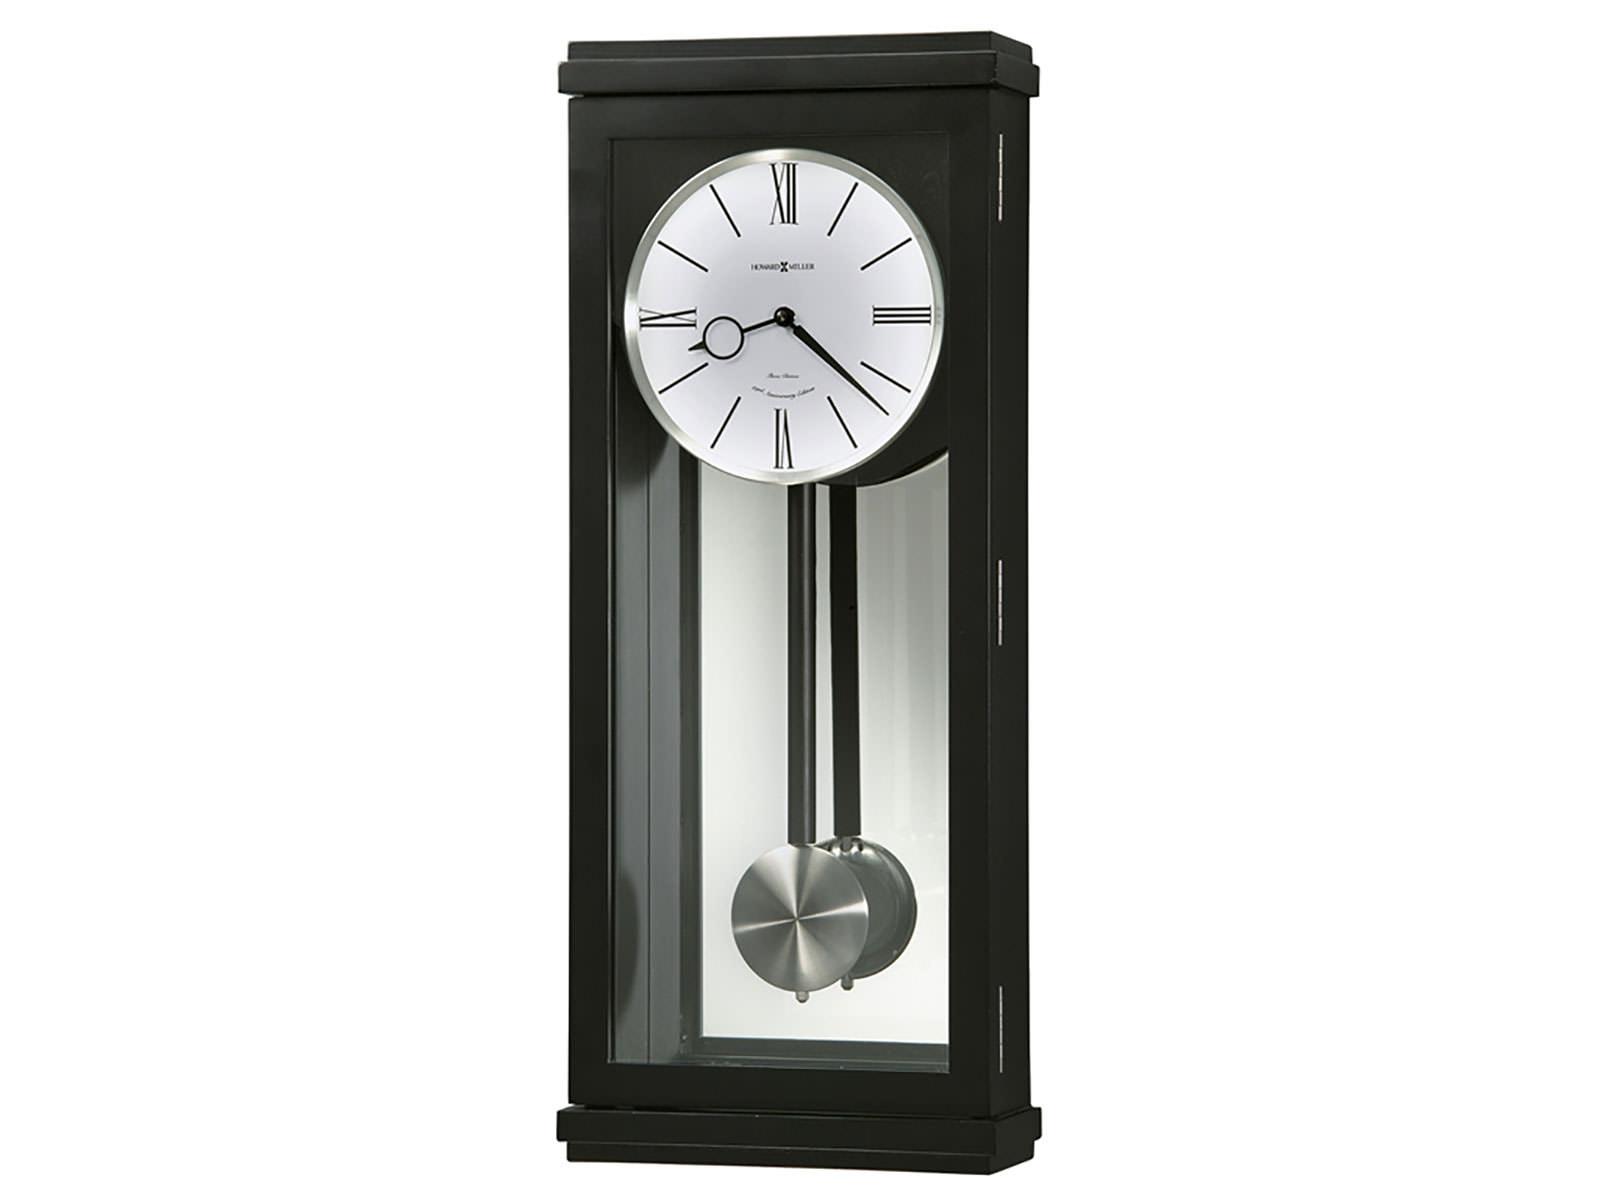 625 440 Alvarez Wall Clock By Howard Miller